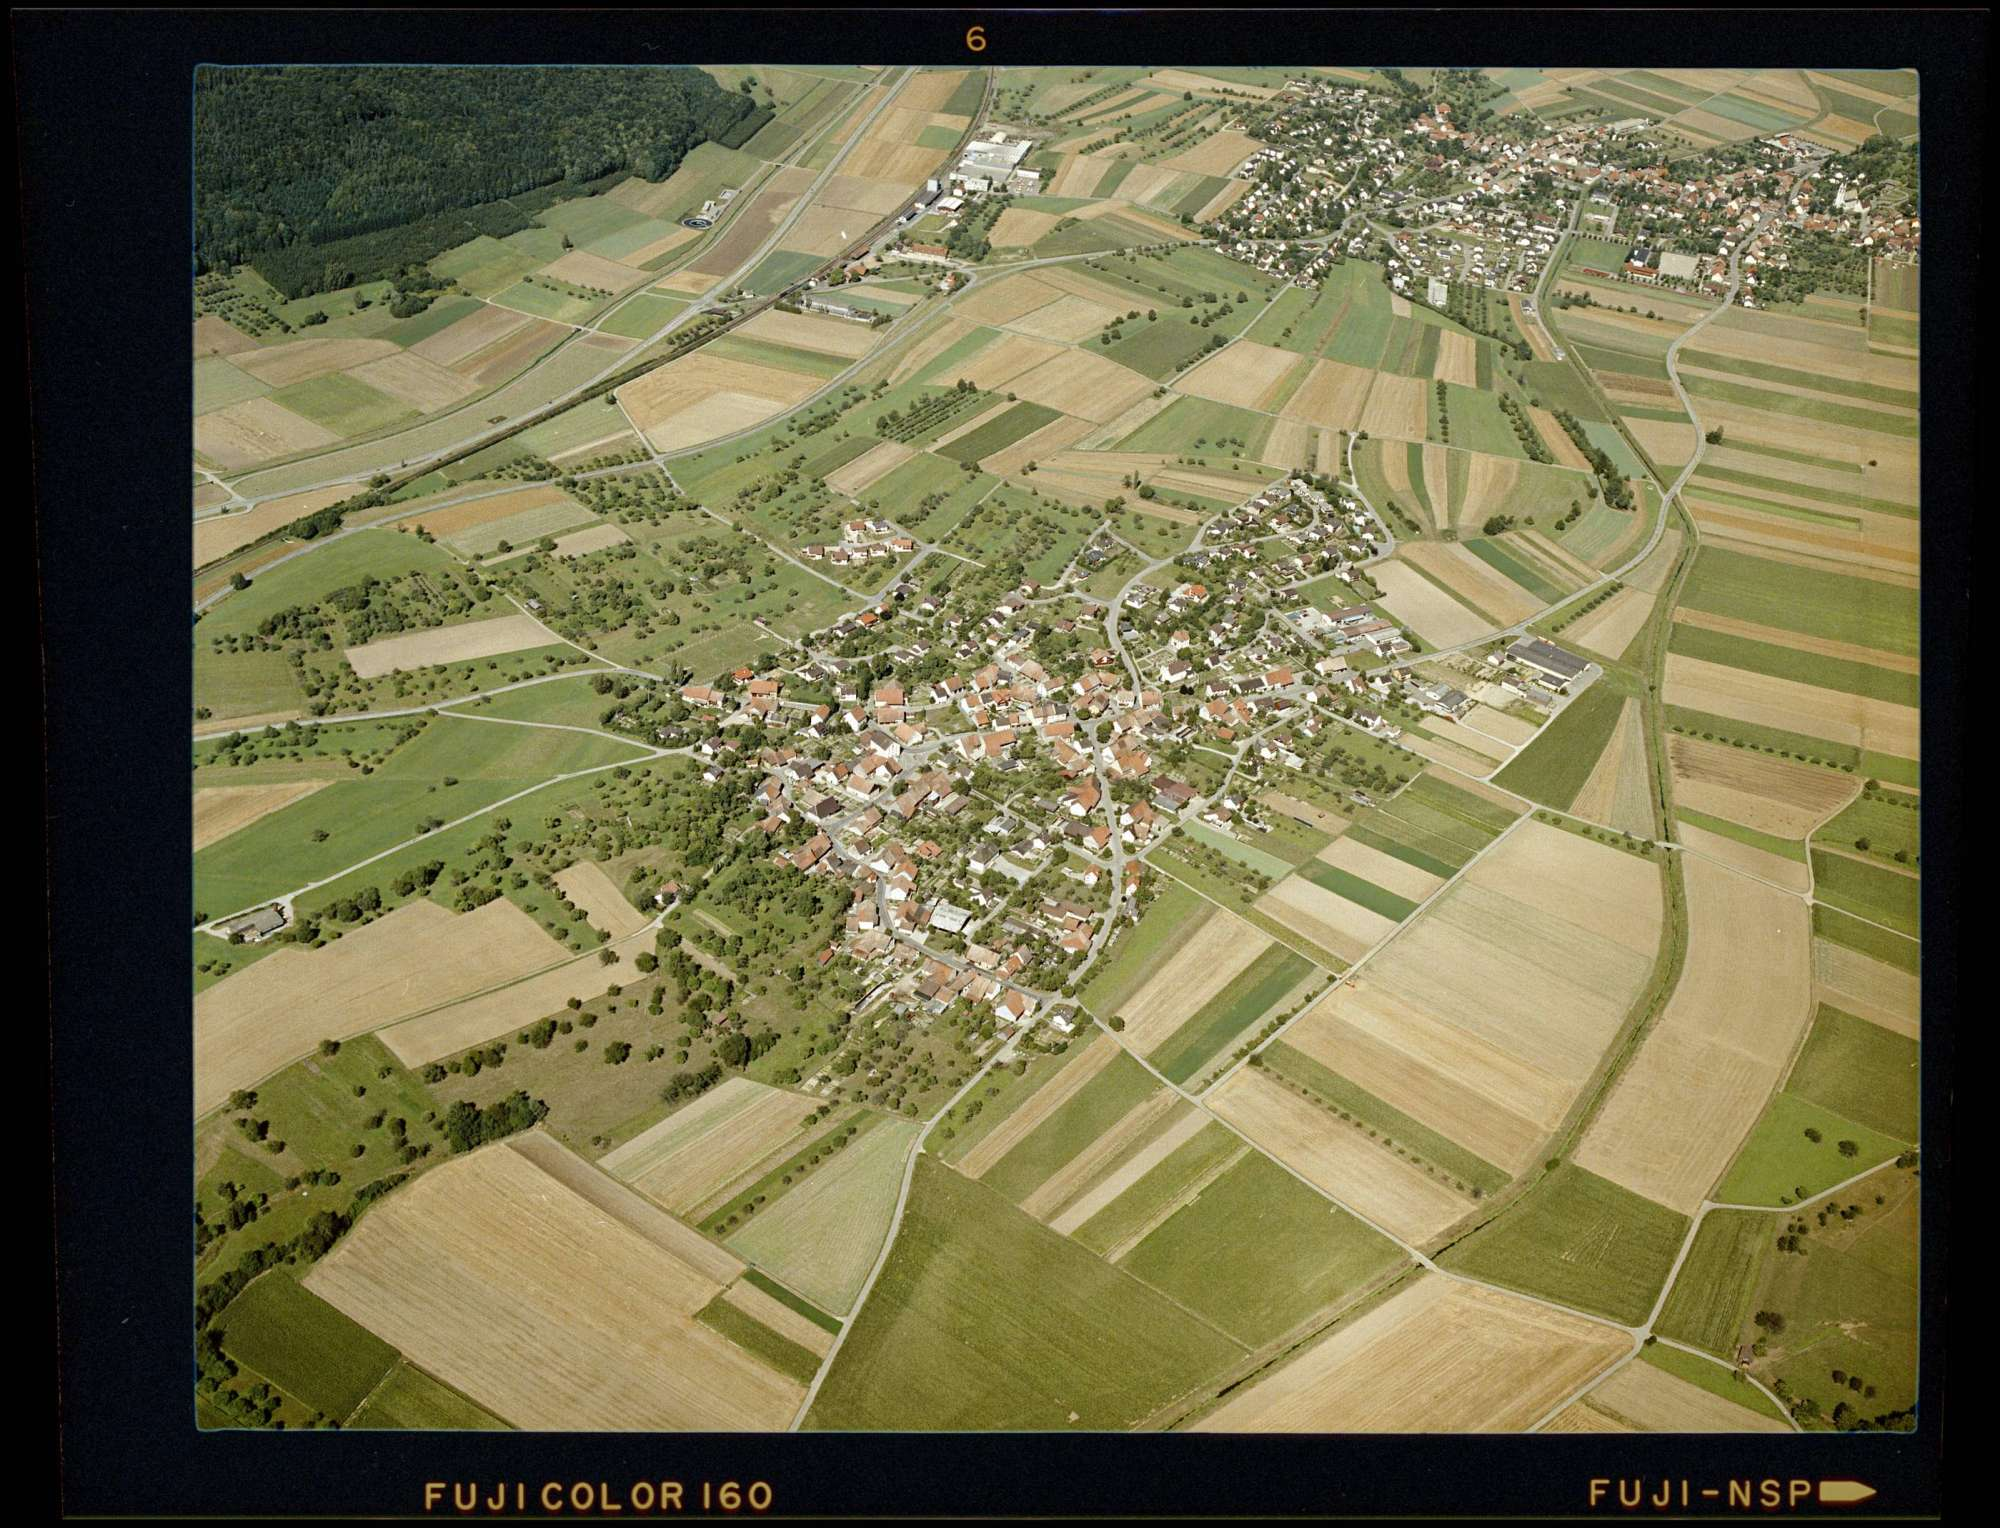 Geißlingen, Luftbild, Bild 1